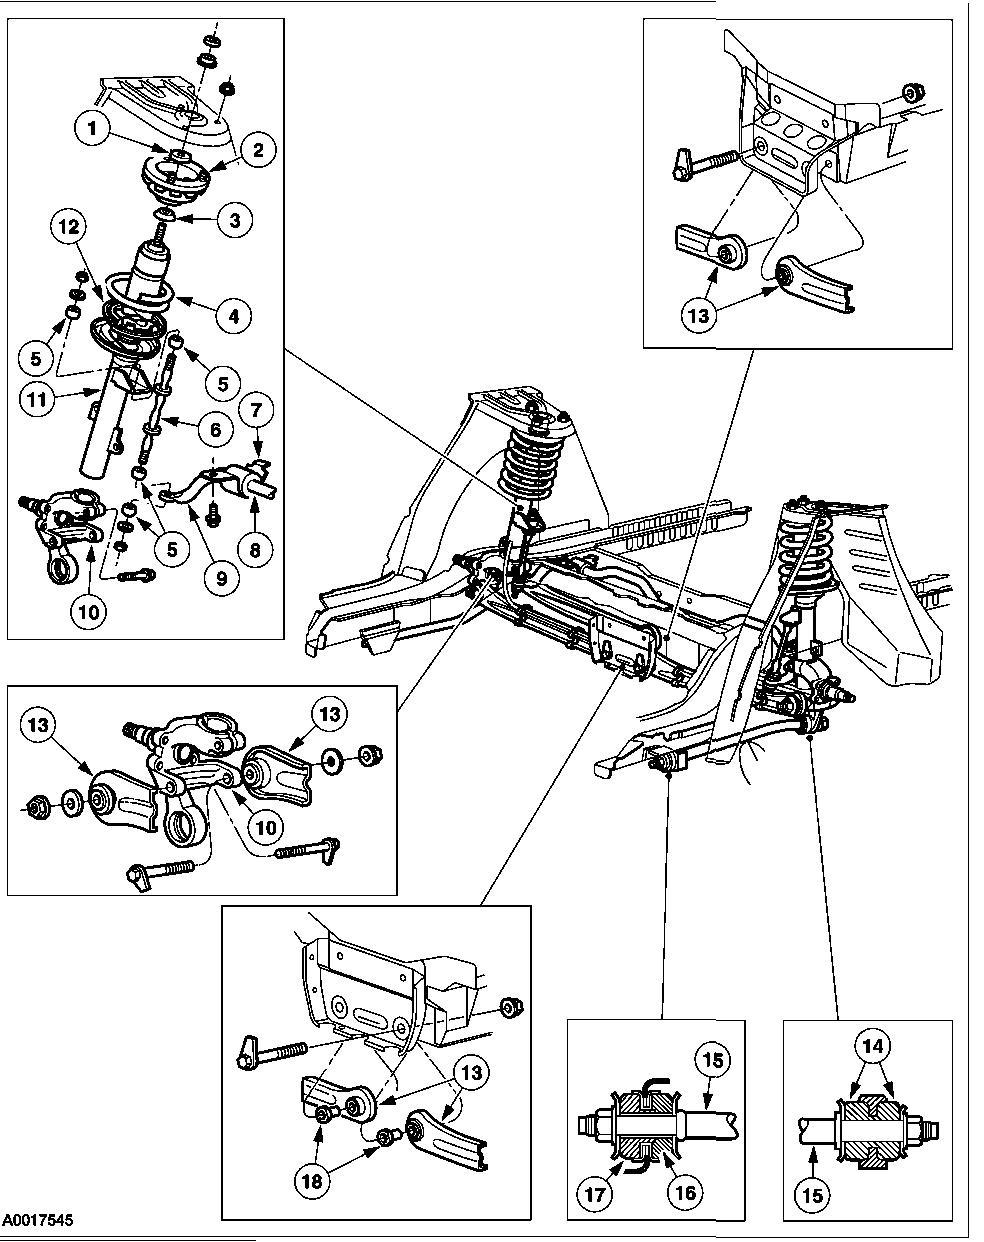 medium resolution of 2000 ford taurus rear suspension diagram wiring diagram third level 2000 ford taurus rear suspension diagram